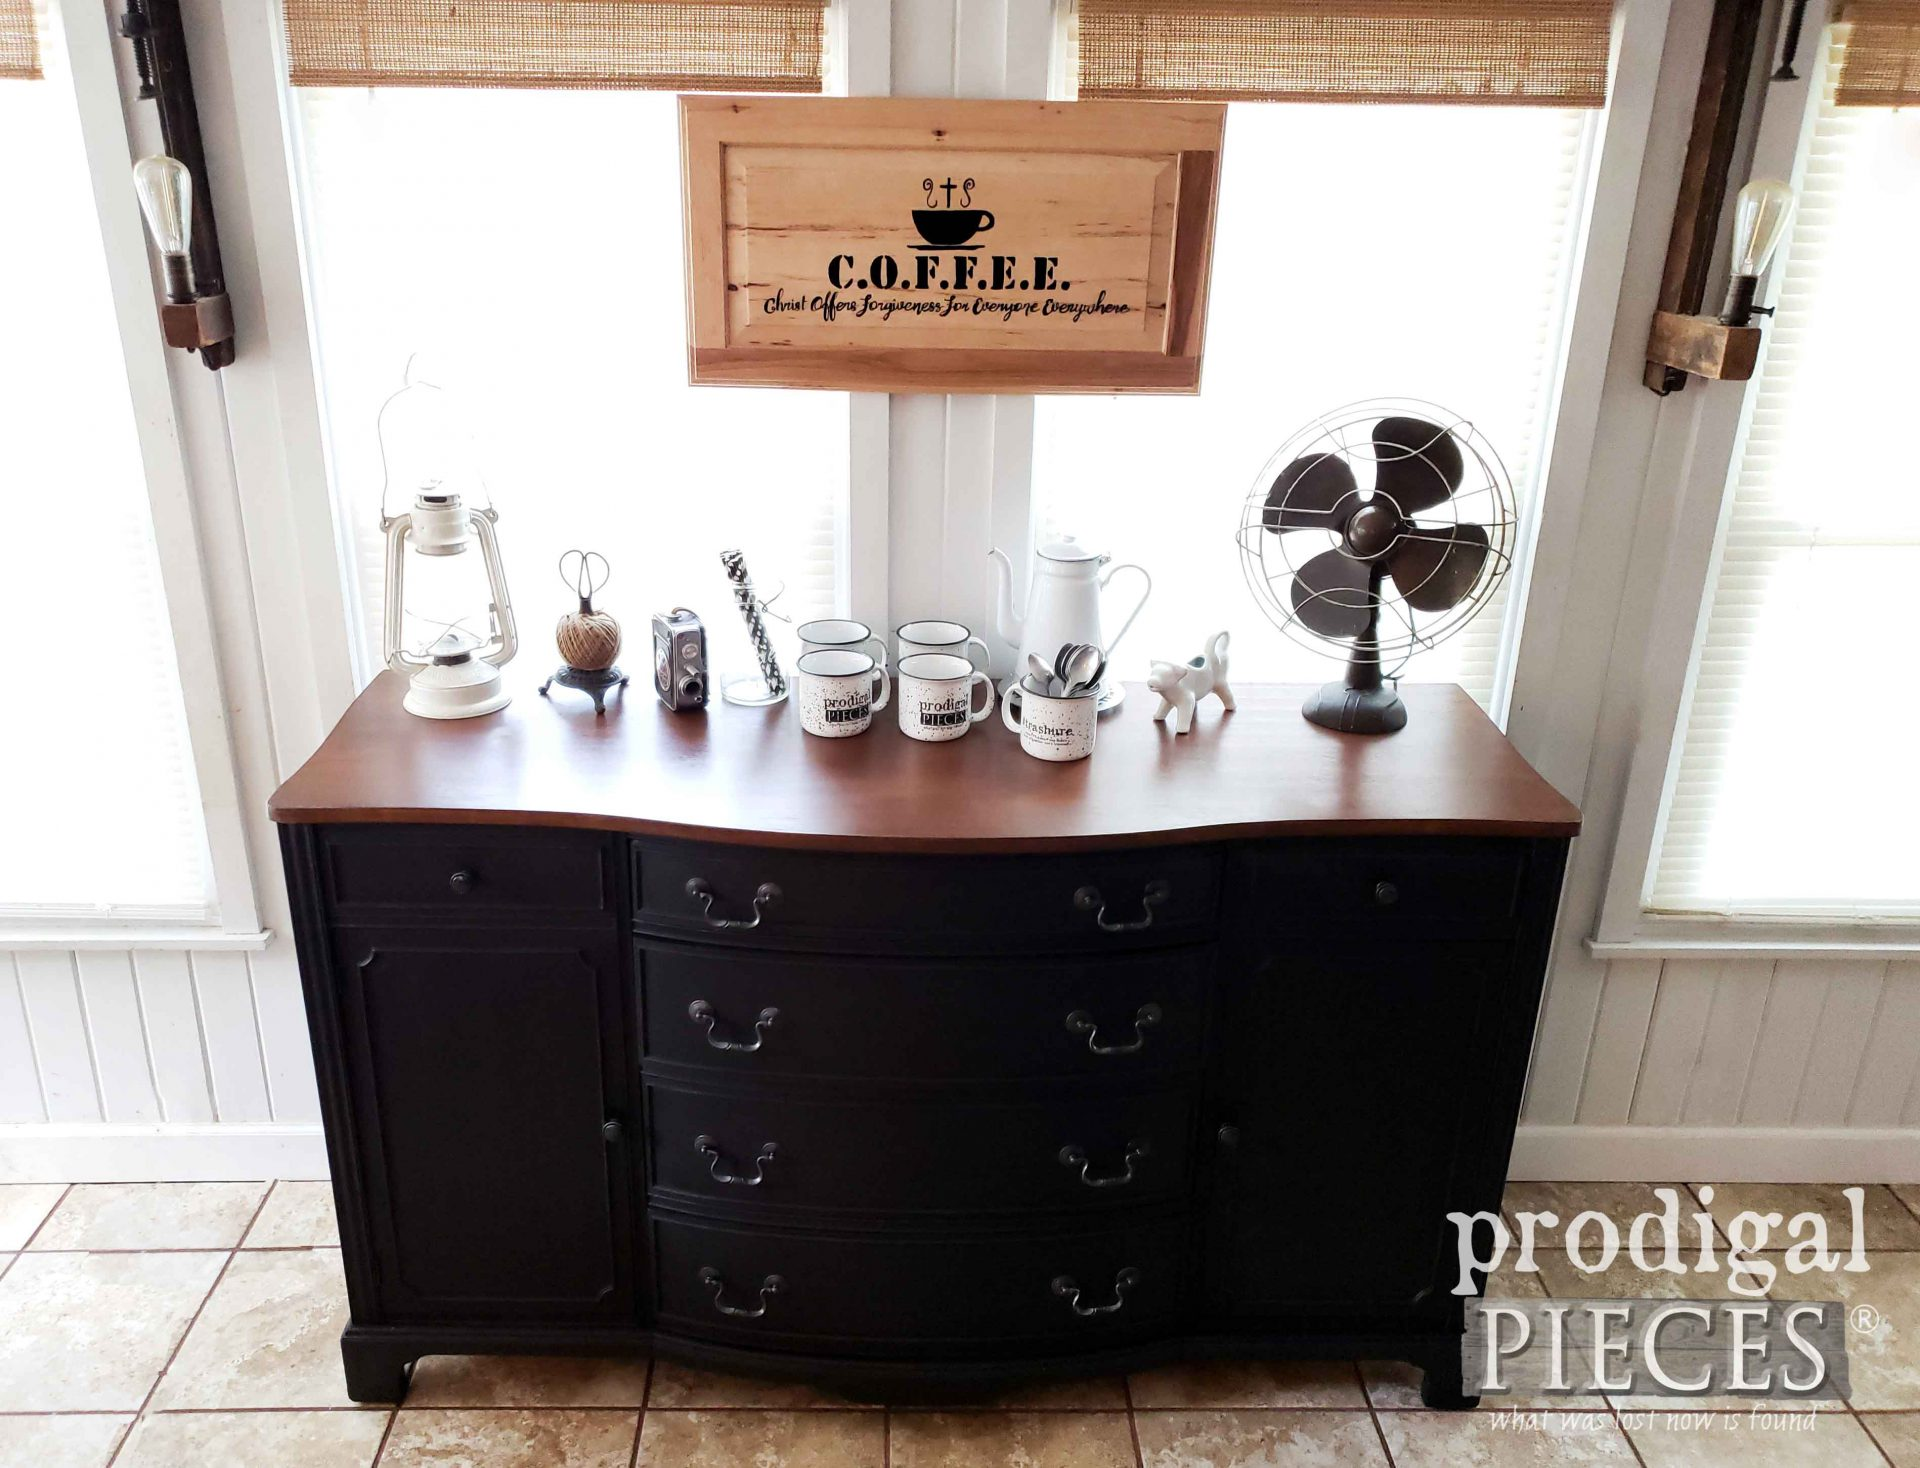 Black Buffet Coffee Bar Top by Larissa of Prodigal Pieces | prodigalpieces.com #prodigalpieces #diy #home #farmhouse #coffee #homedecor